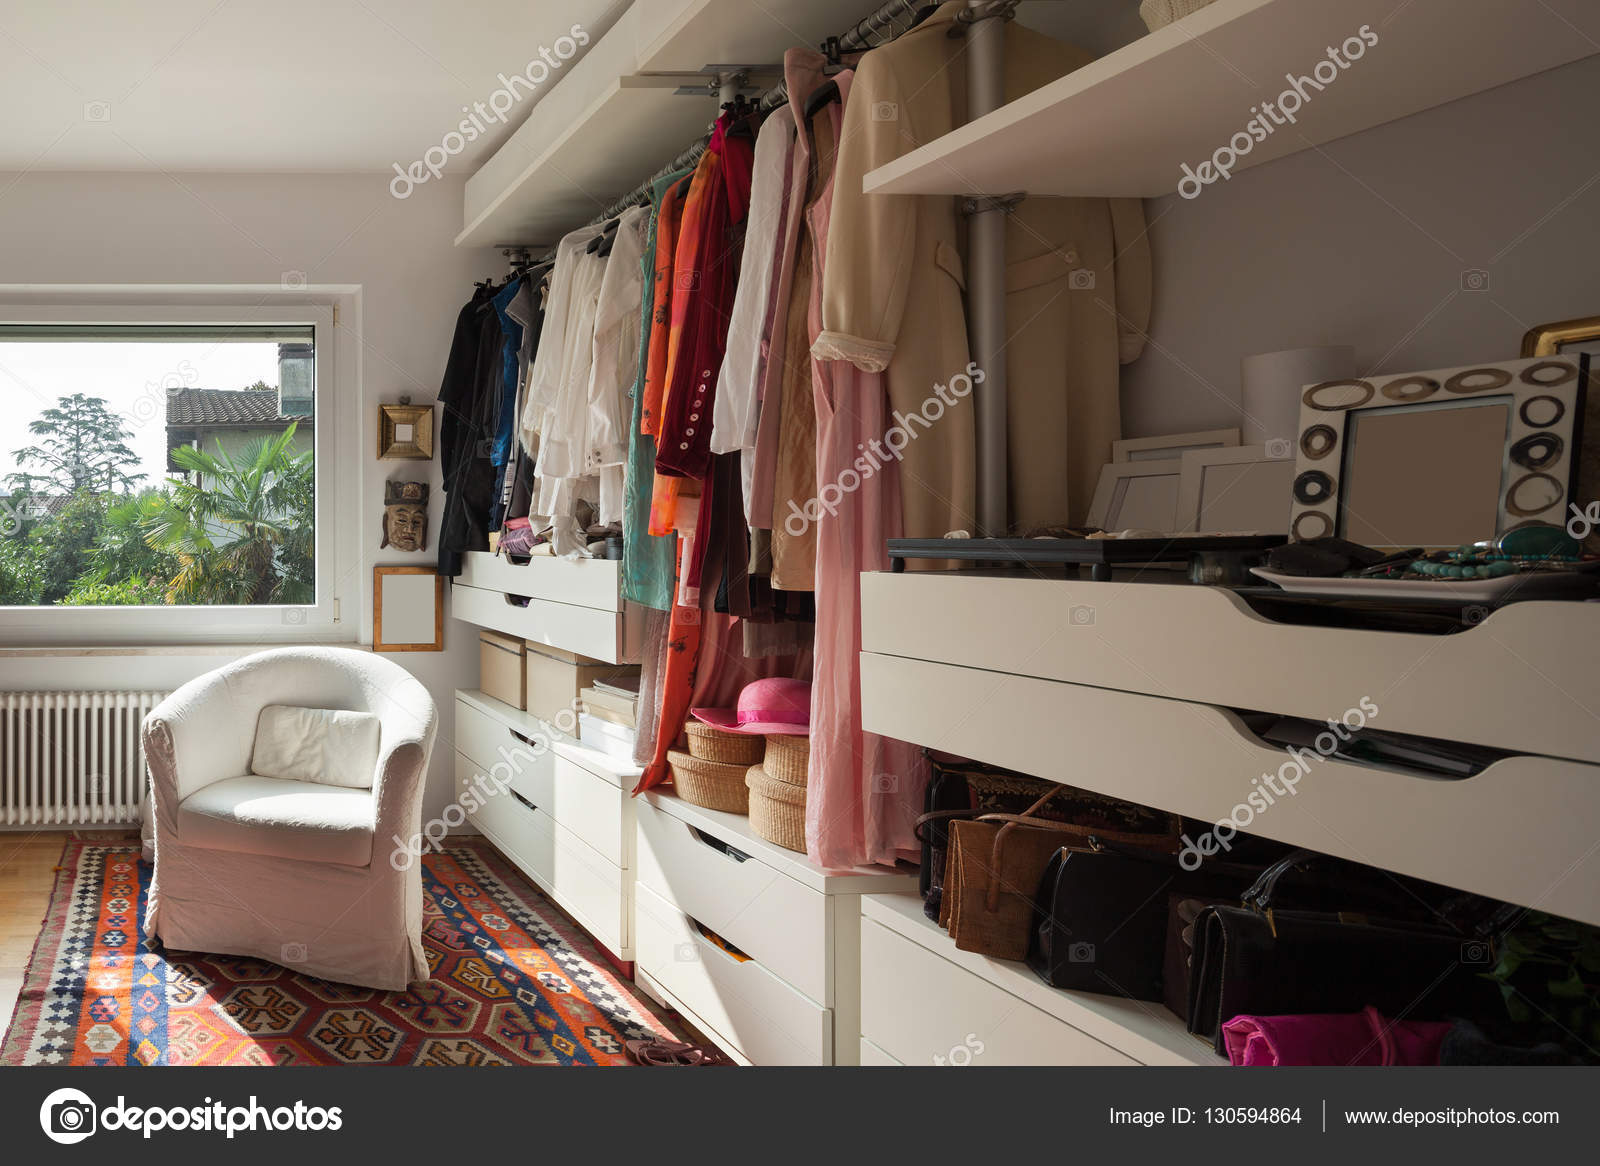 Slaapkamer Of Kledingkast : Kledingkast van een slaapkamer u stockfoto zveiger